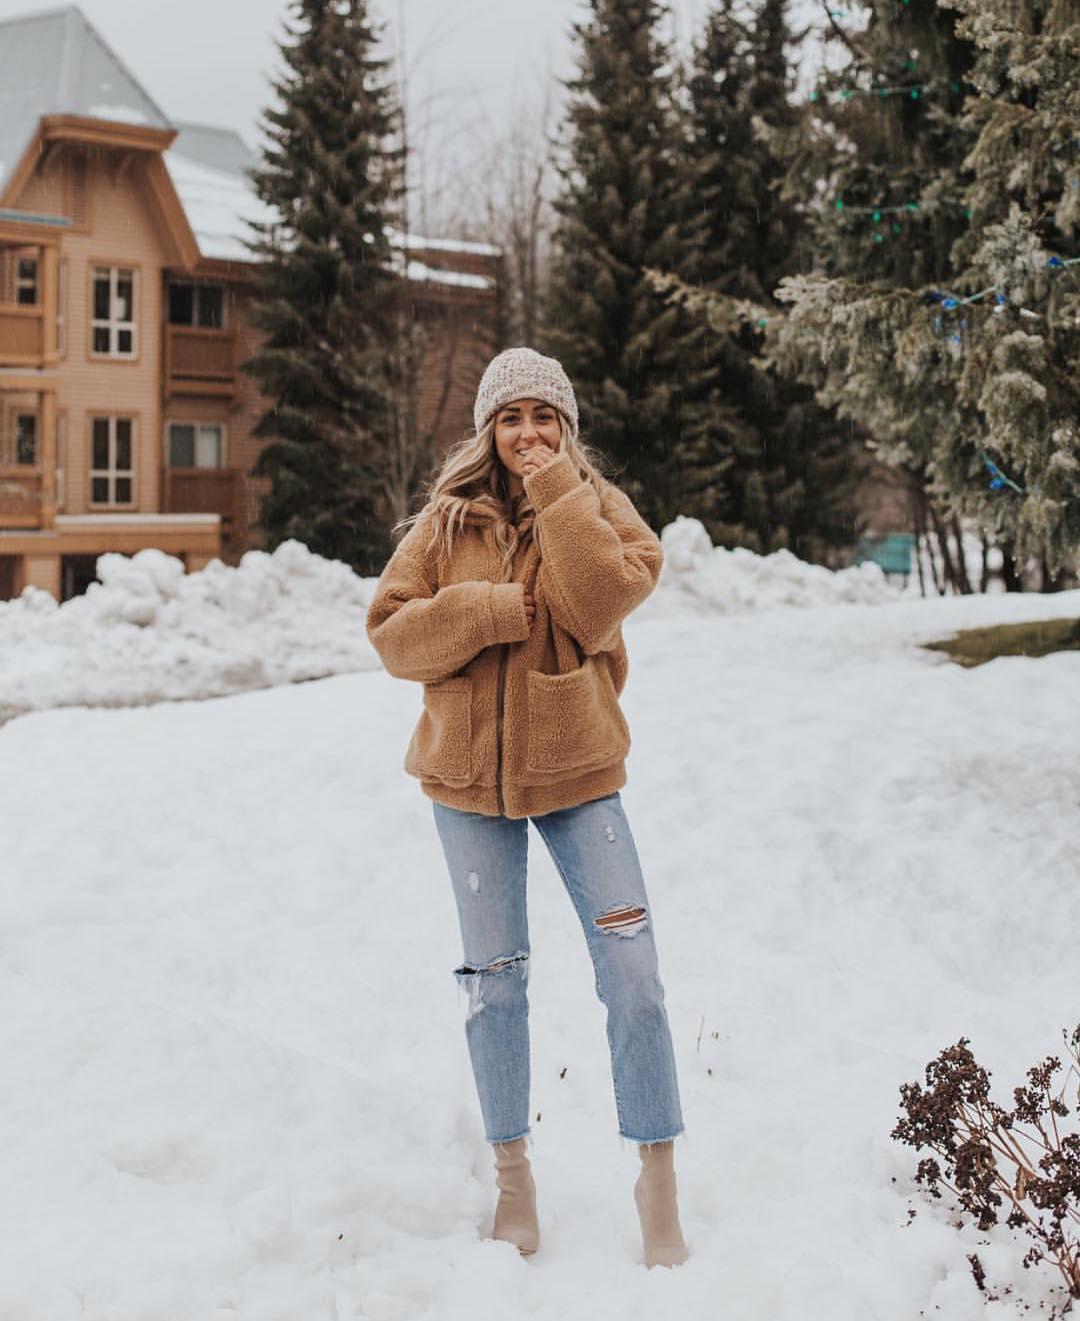 Winter Urban Holiday Essentials For Women